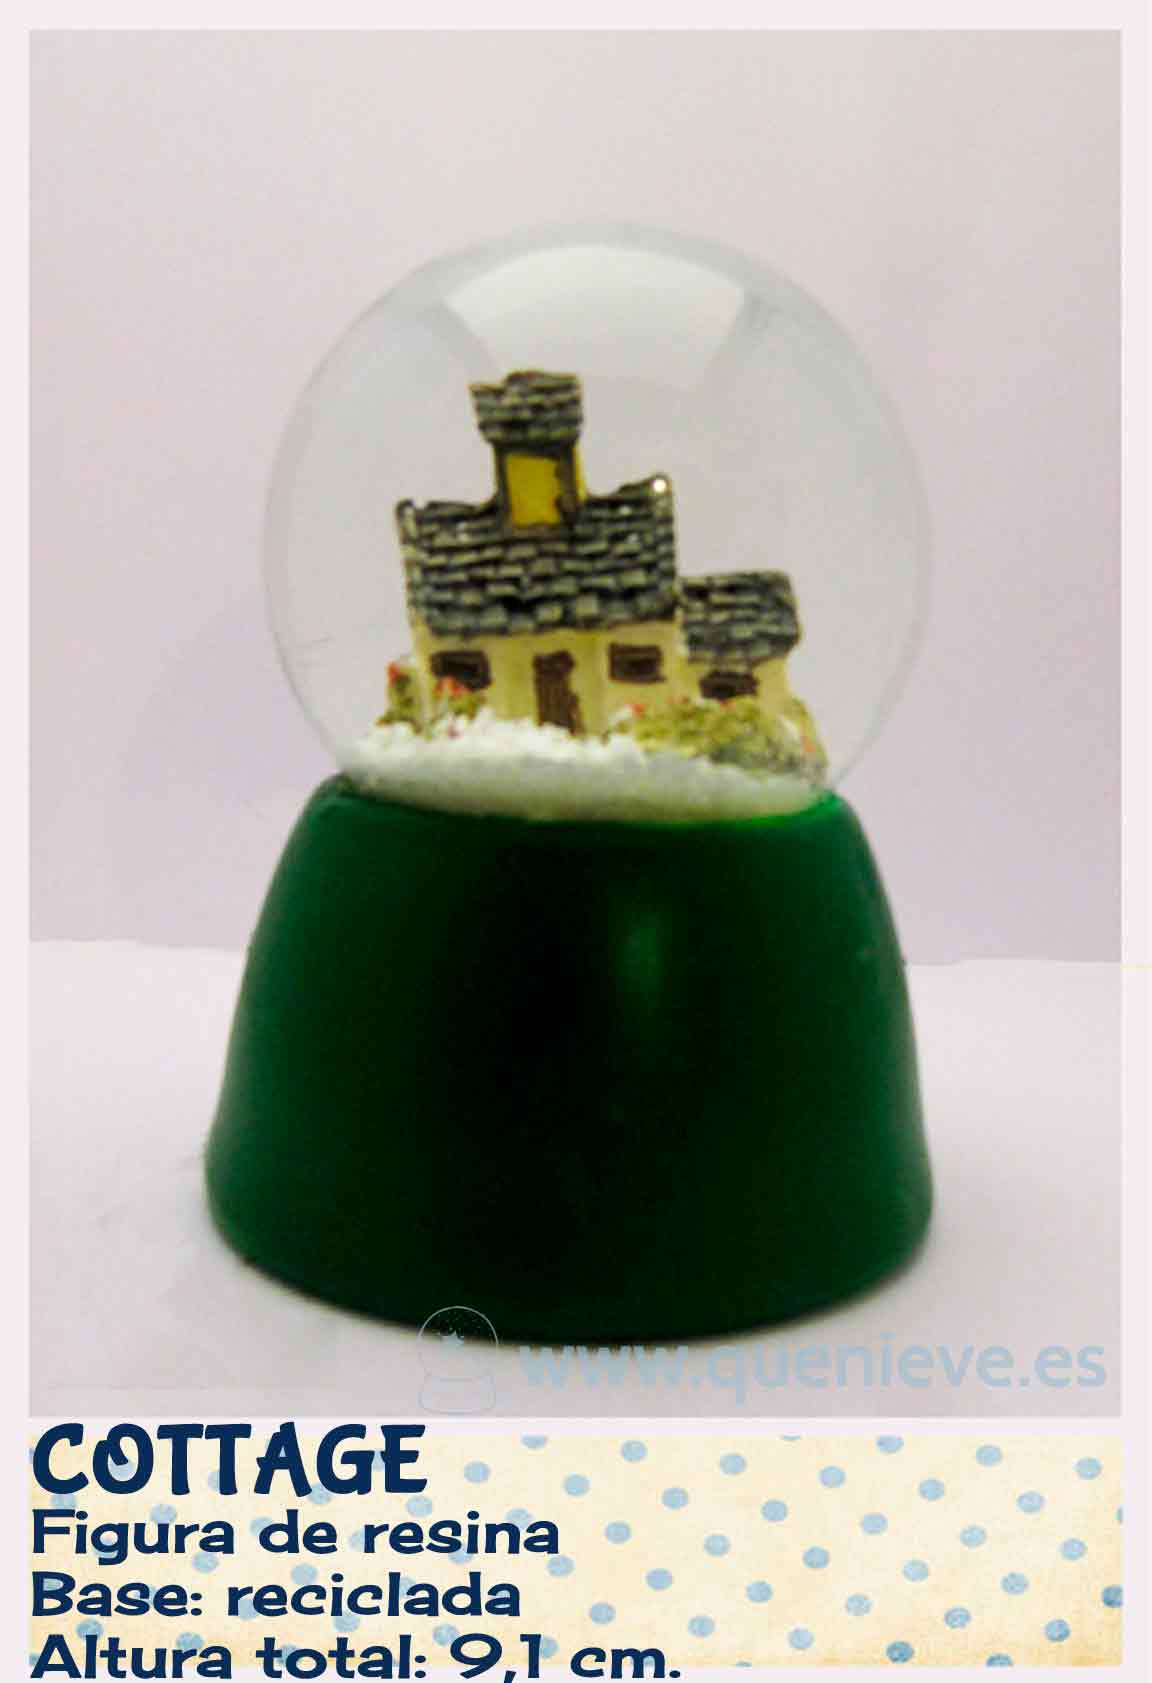 Bola de nieve personalizada con figura resina. Creada por QueNieve